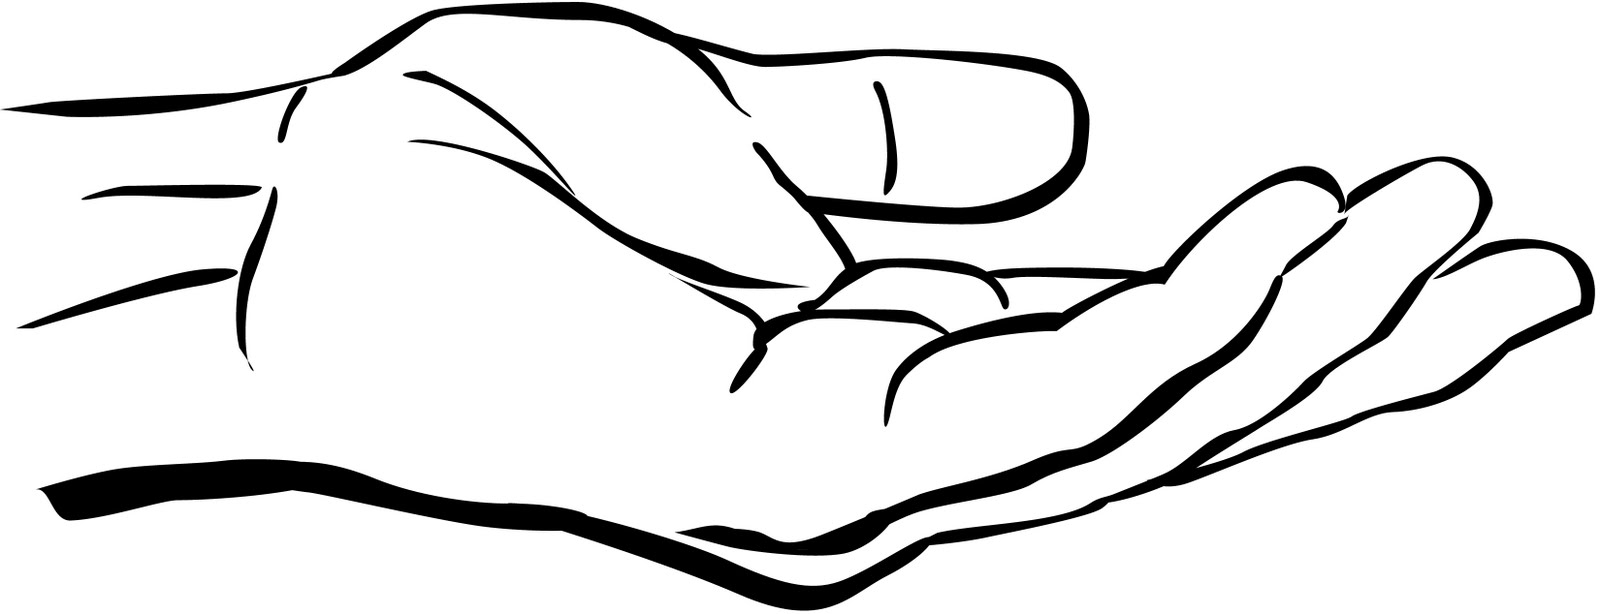 Open Hand - ClipArt Best